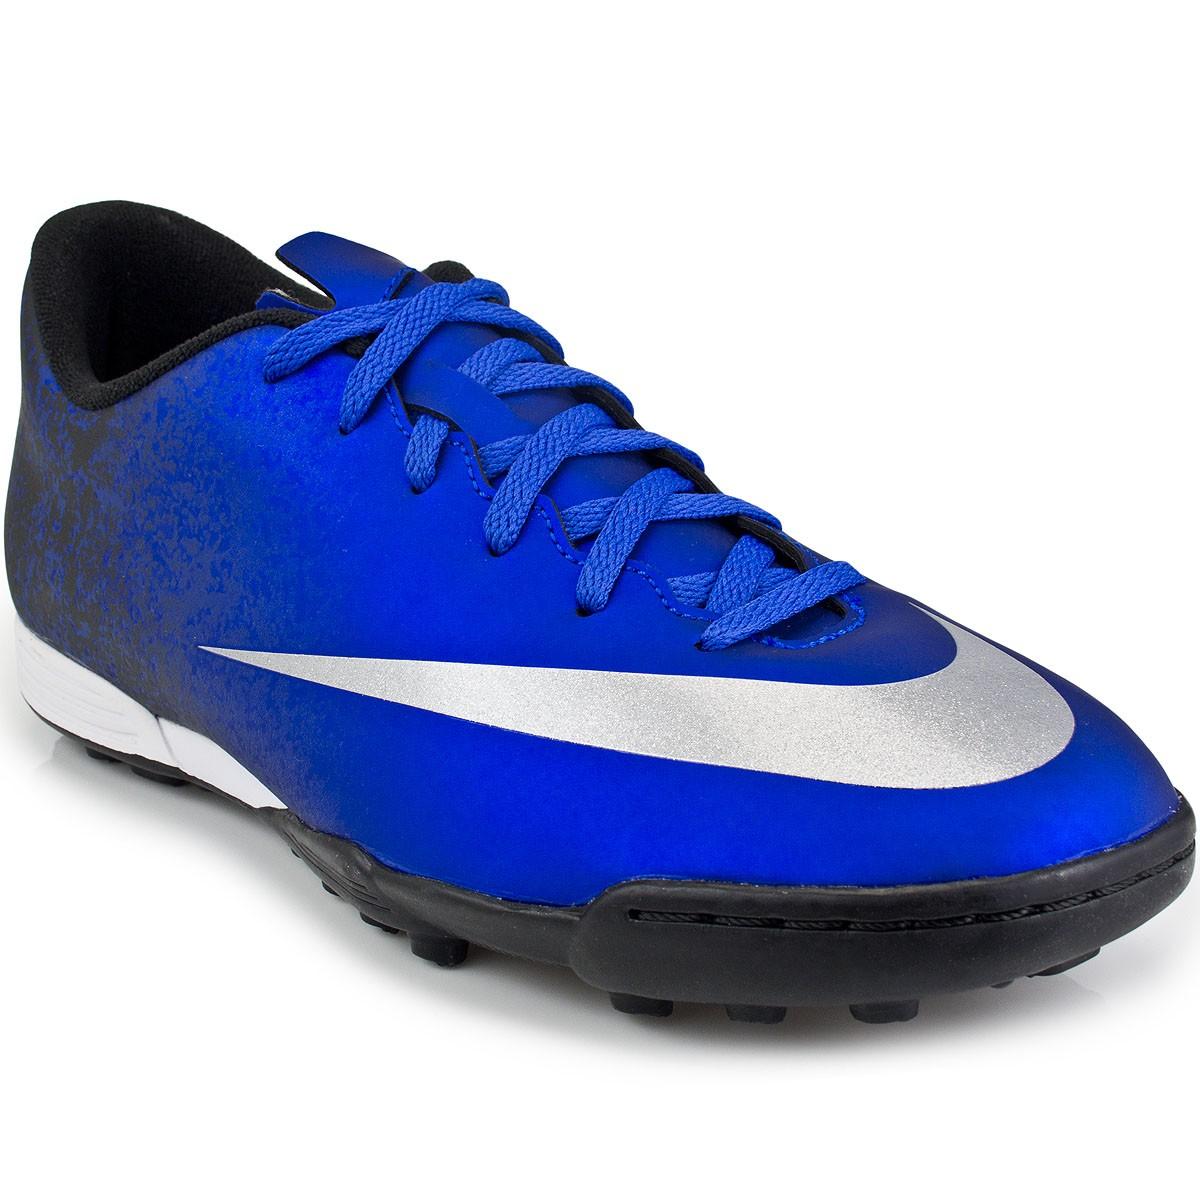 Chuteira Nike Mercurial Vortex II CR TF  d3169d8ace62a